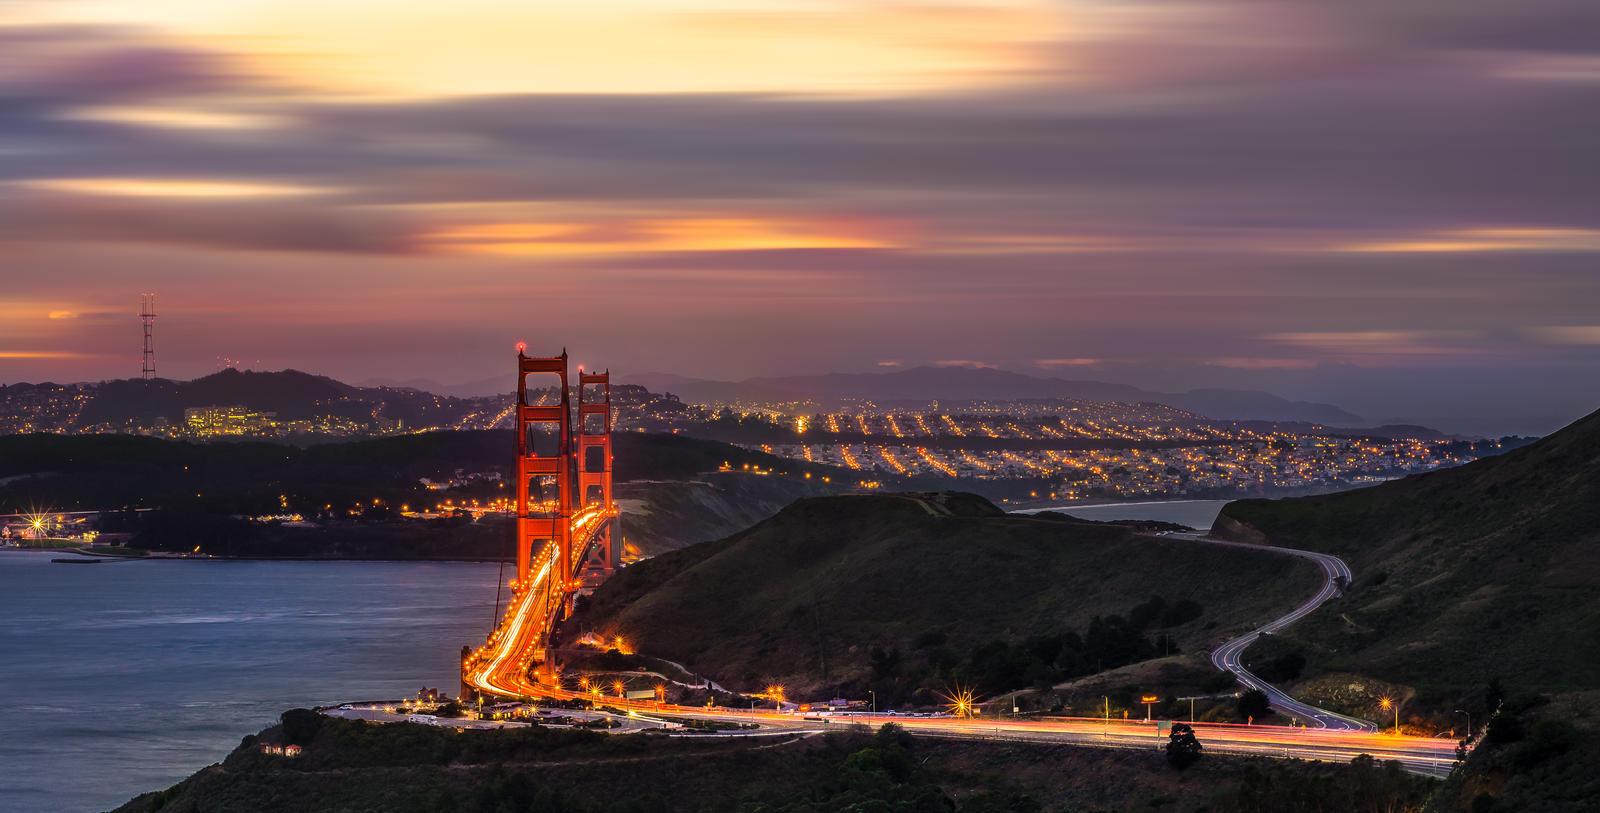 Magical morning | San Francisco by alierturk